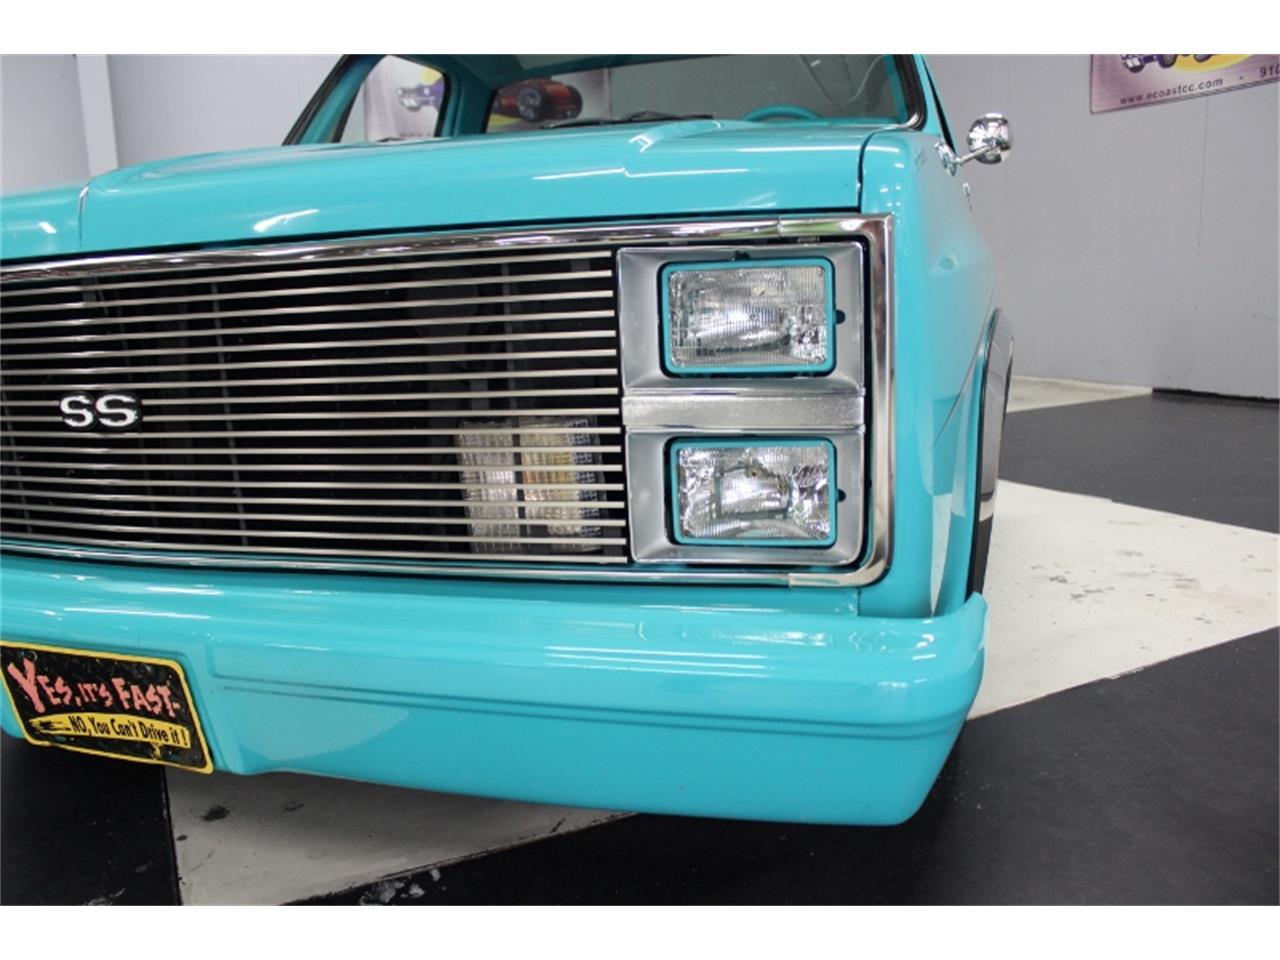 Large Picture of 1981 C10 located in Lillington North Carolina - $27,000.00 - MDDW